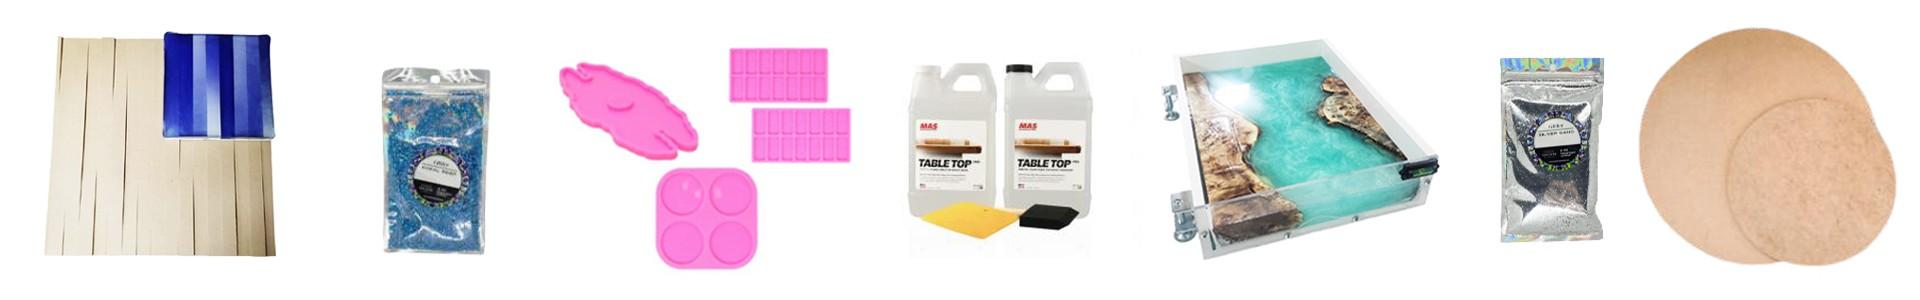 epoxy-kits-preview-all